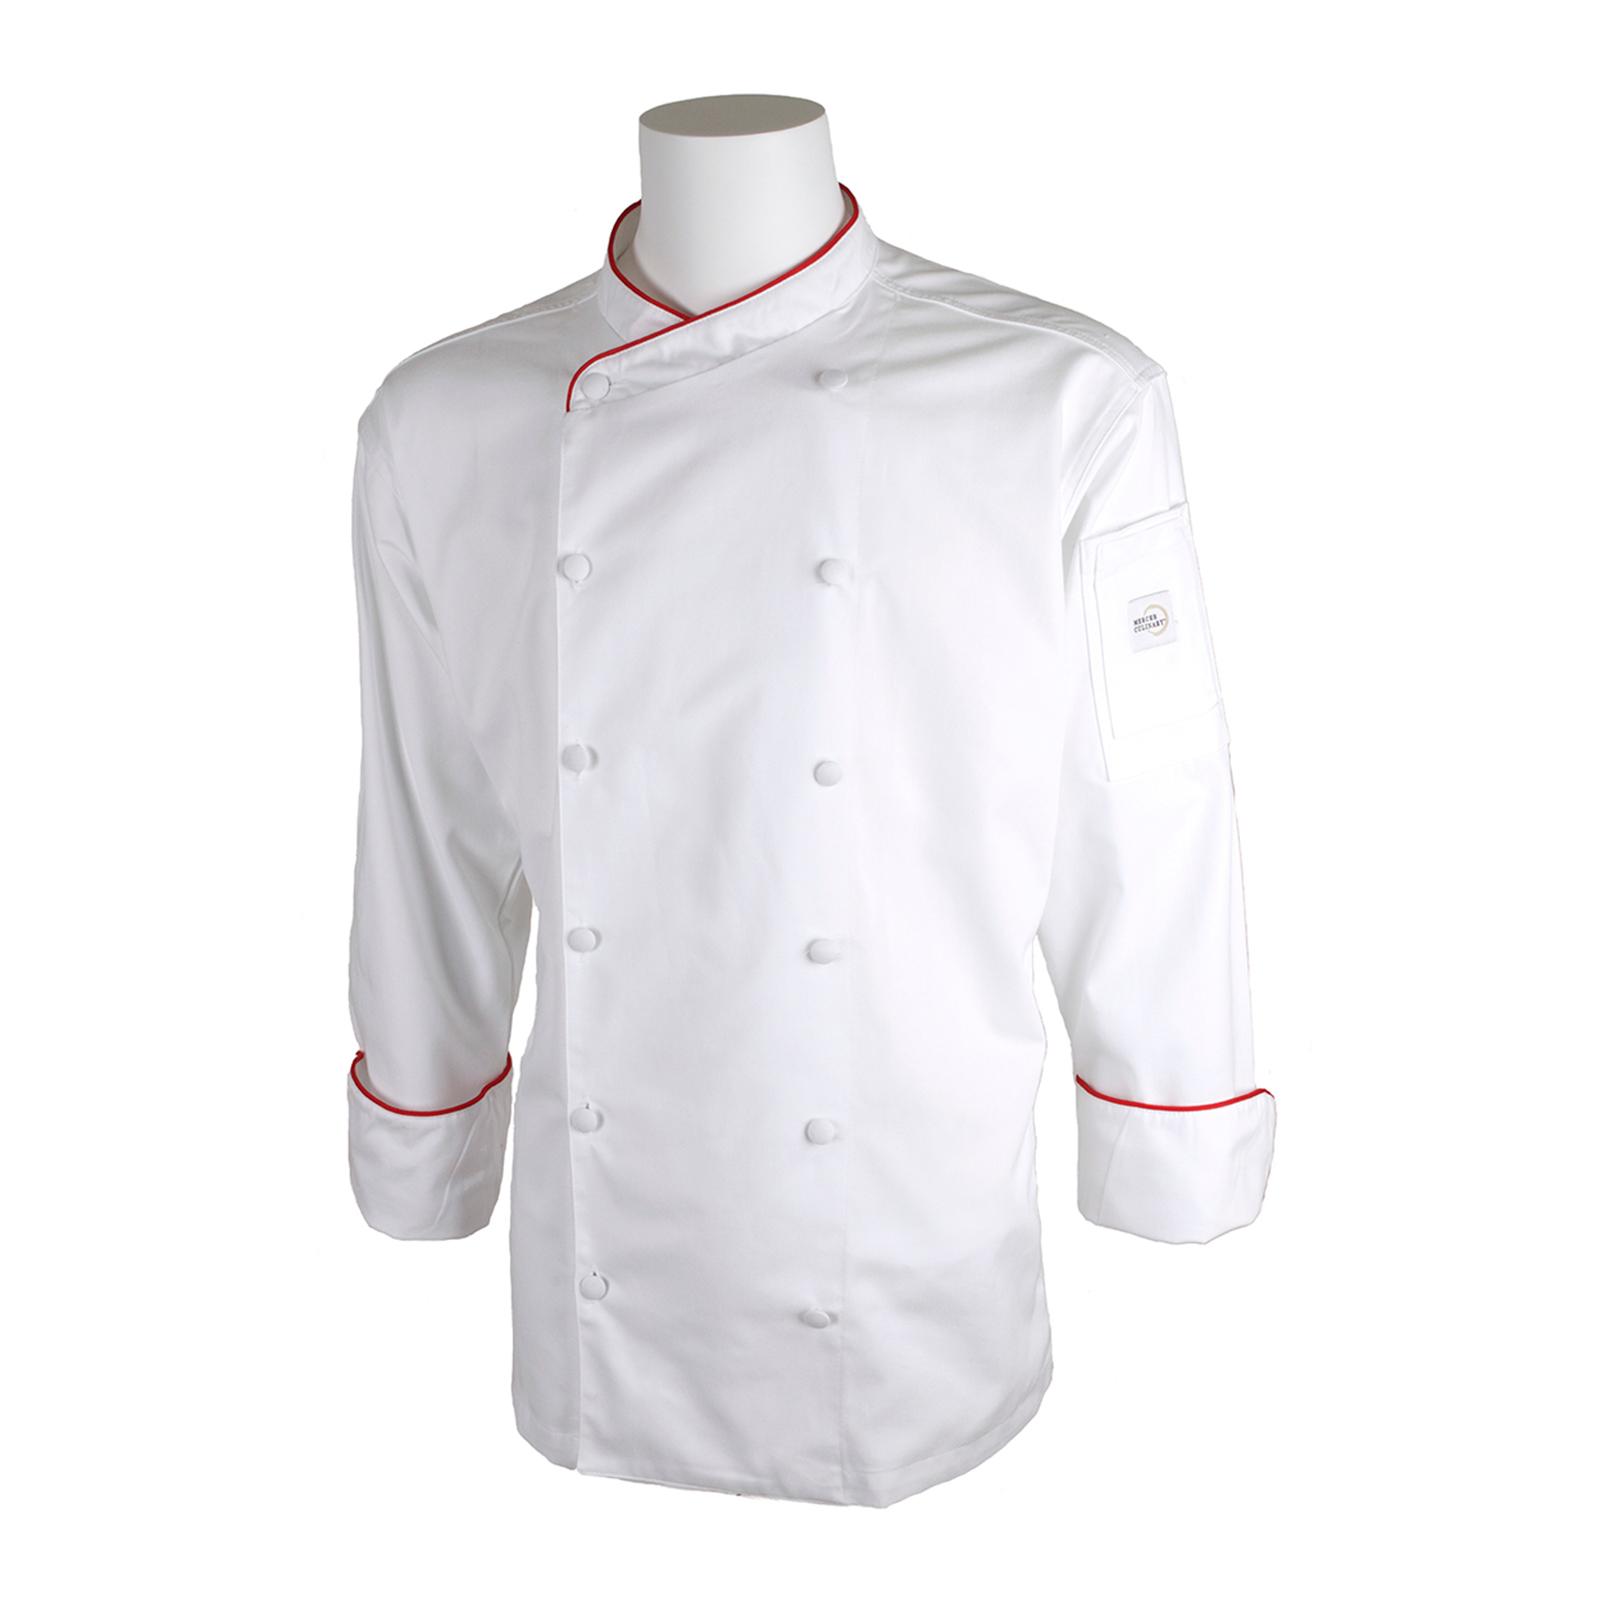 Mercer Culinary M62015WRXS chef's coat